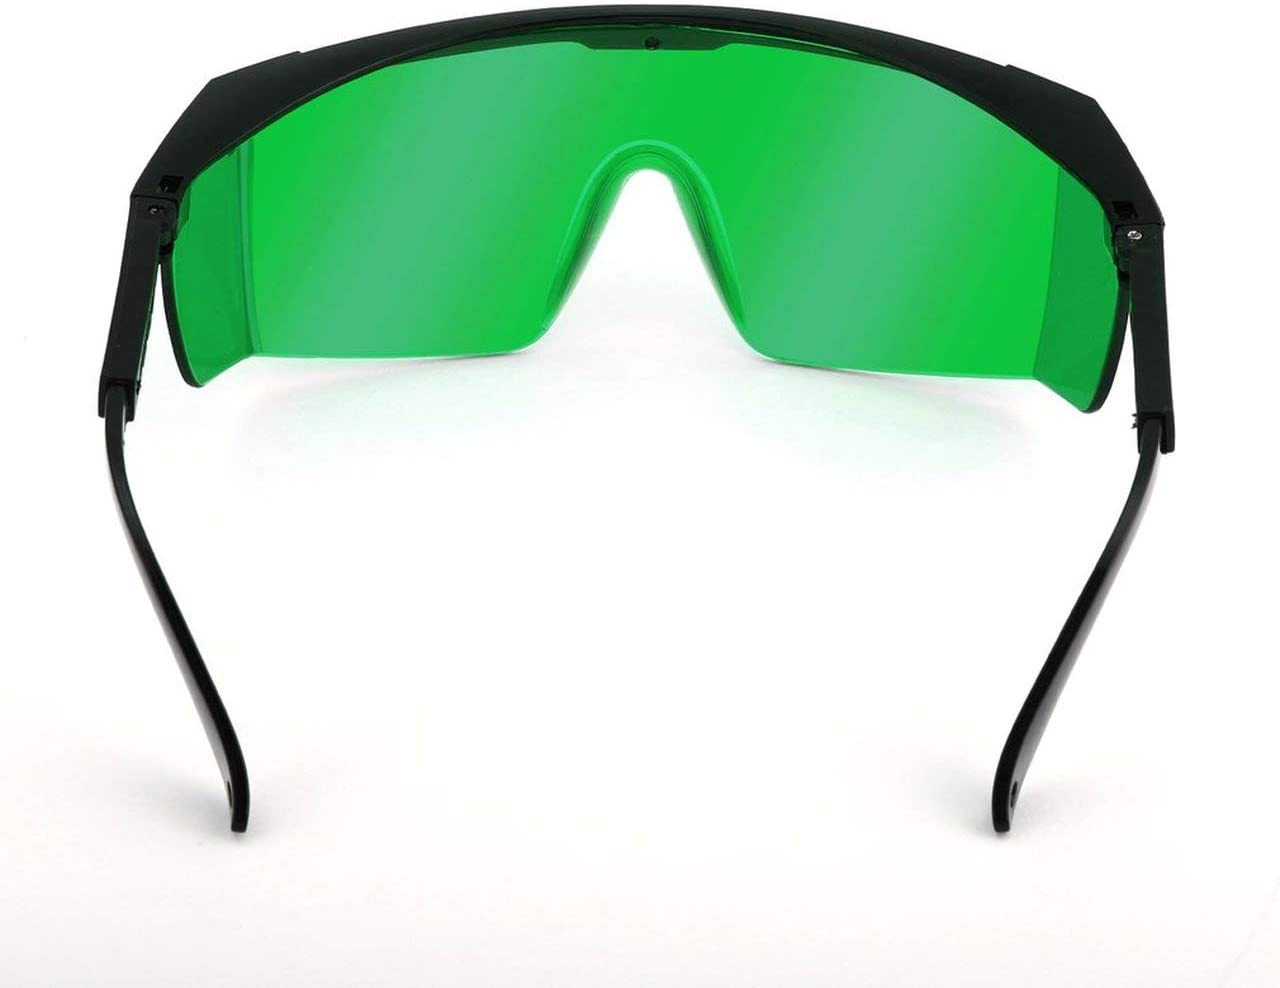 Gafas de seguridad láser para violeta/azul 200-450/800-2000nm Absorción Gafas de protección redondas Gafas de protección láser Gafas de montura negra y lente verde Jasnyfall